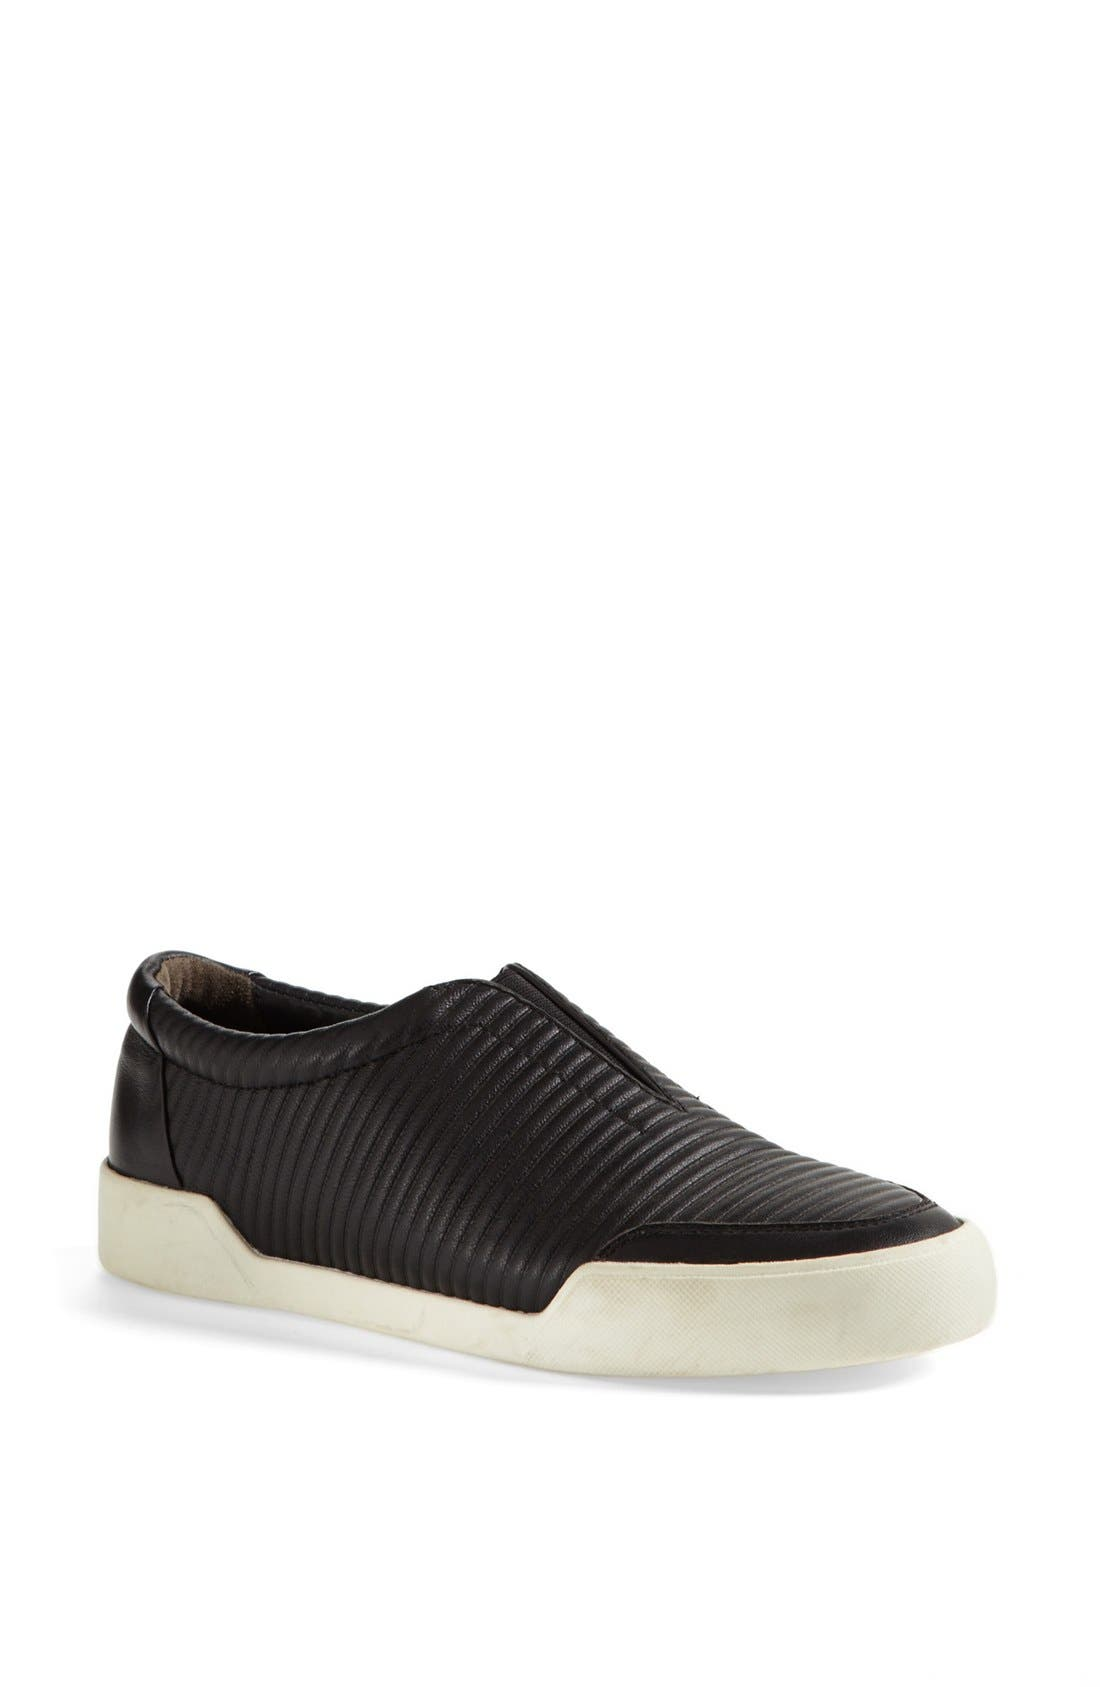 'Morgan' Slip-On Sneaker,                             Main thumbnail 1, color,                             Black